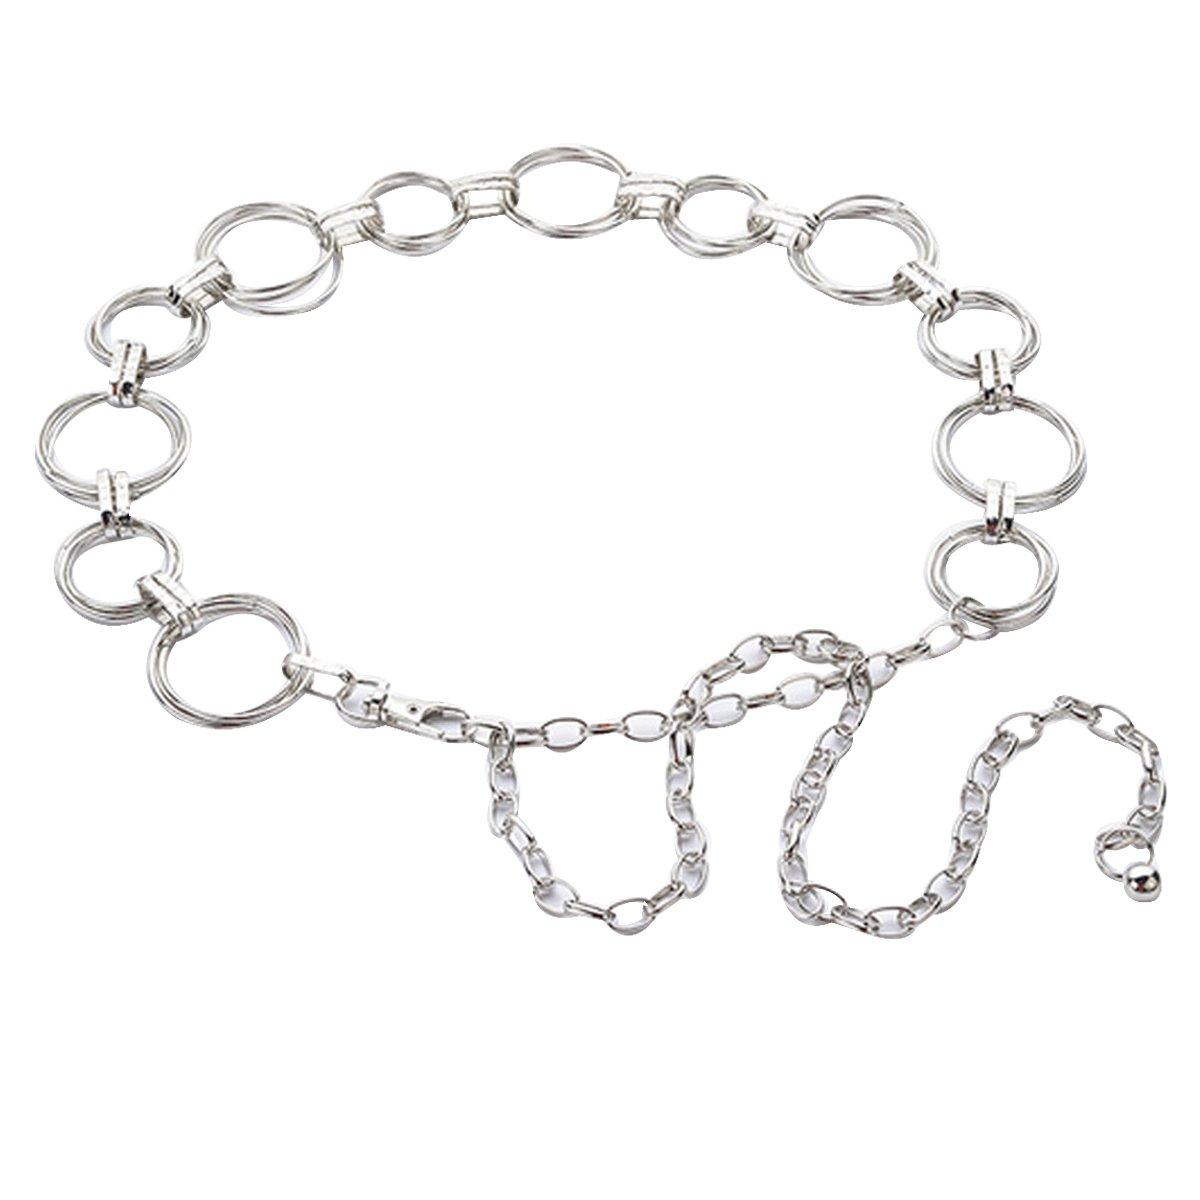 Kennedy Fashion Women Metal Belt Can Adjustable Size Chain Waist Belt For Dress